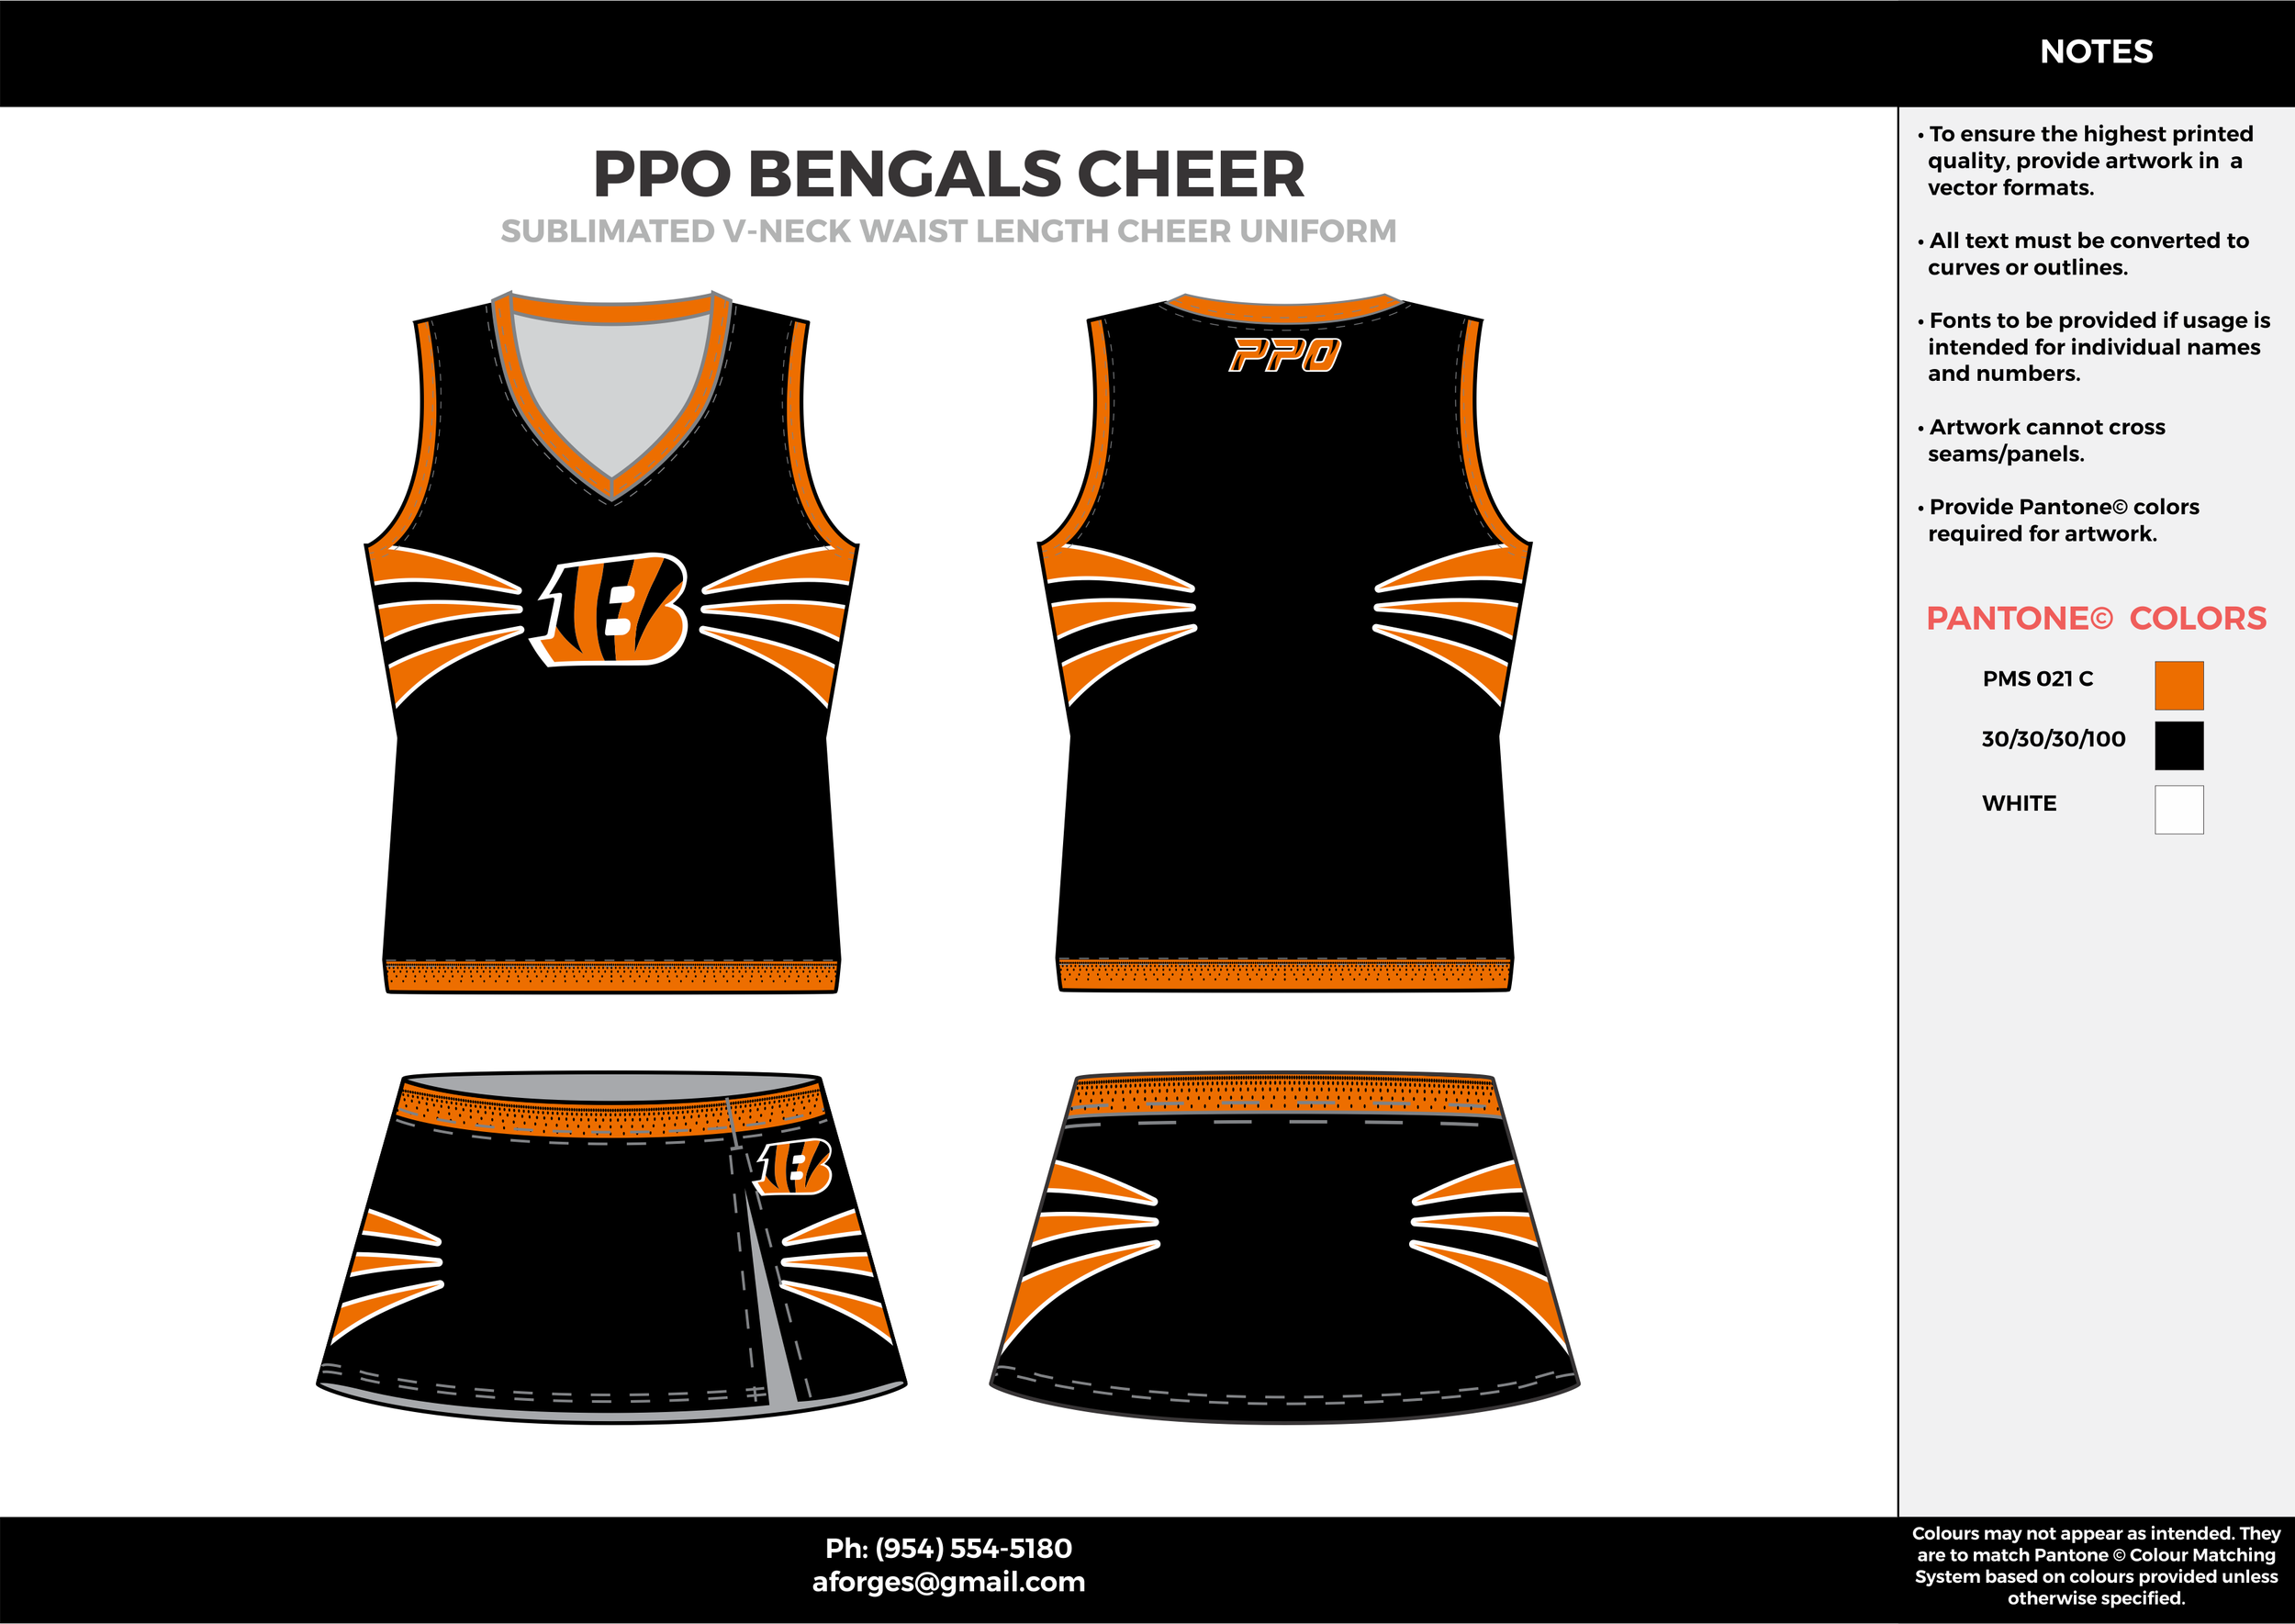 PPO BENGALS CHEER black orange white cheerleading uniforms, top, and skirt